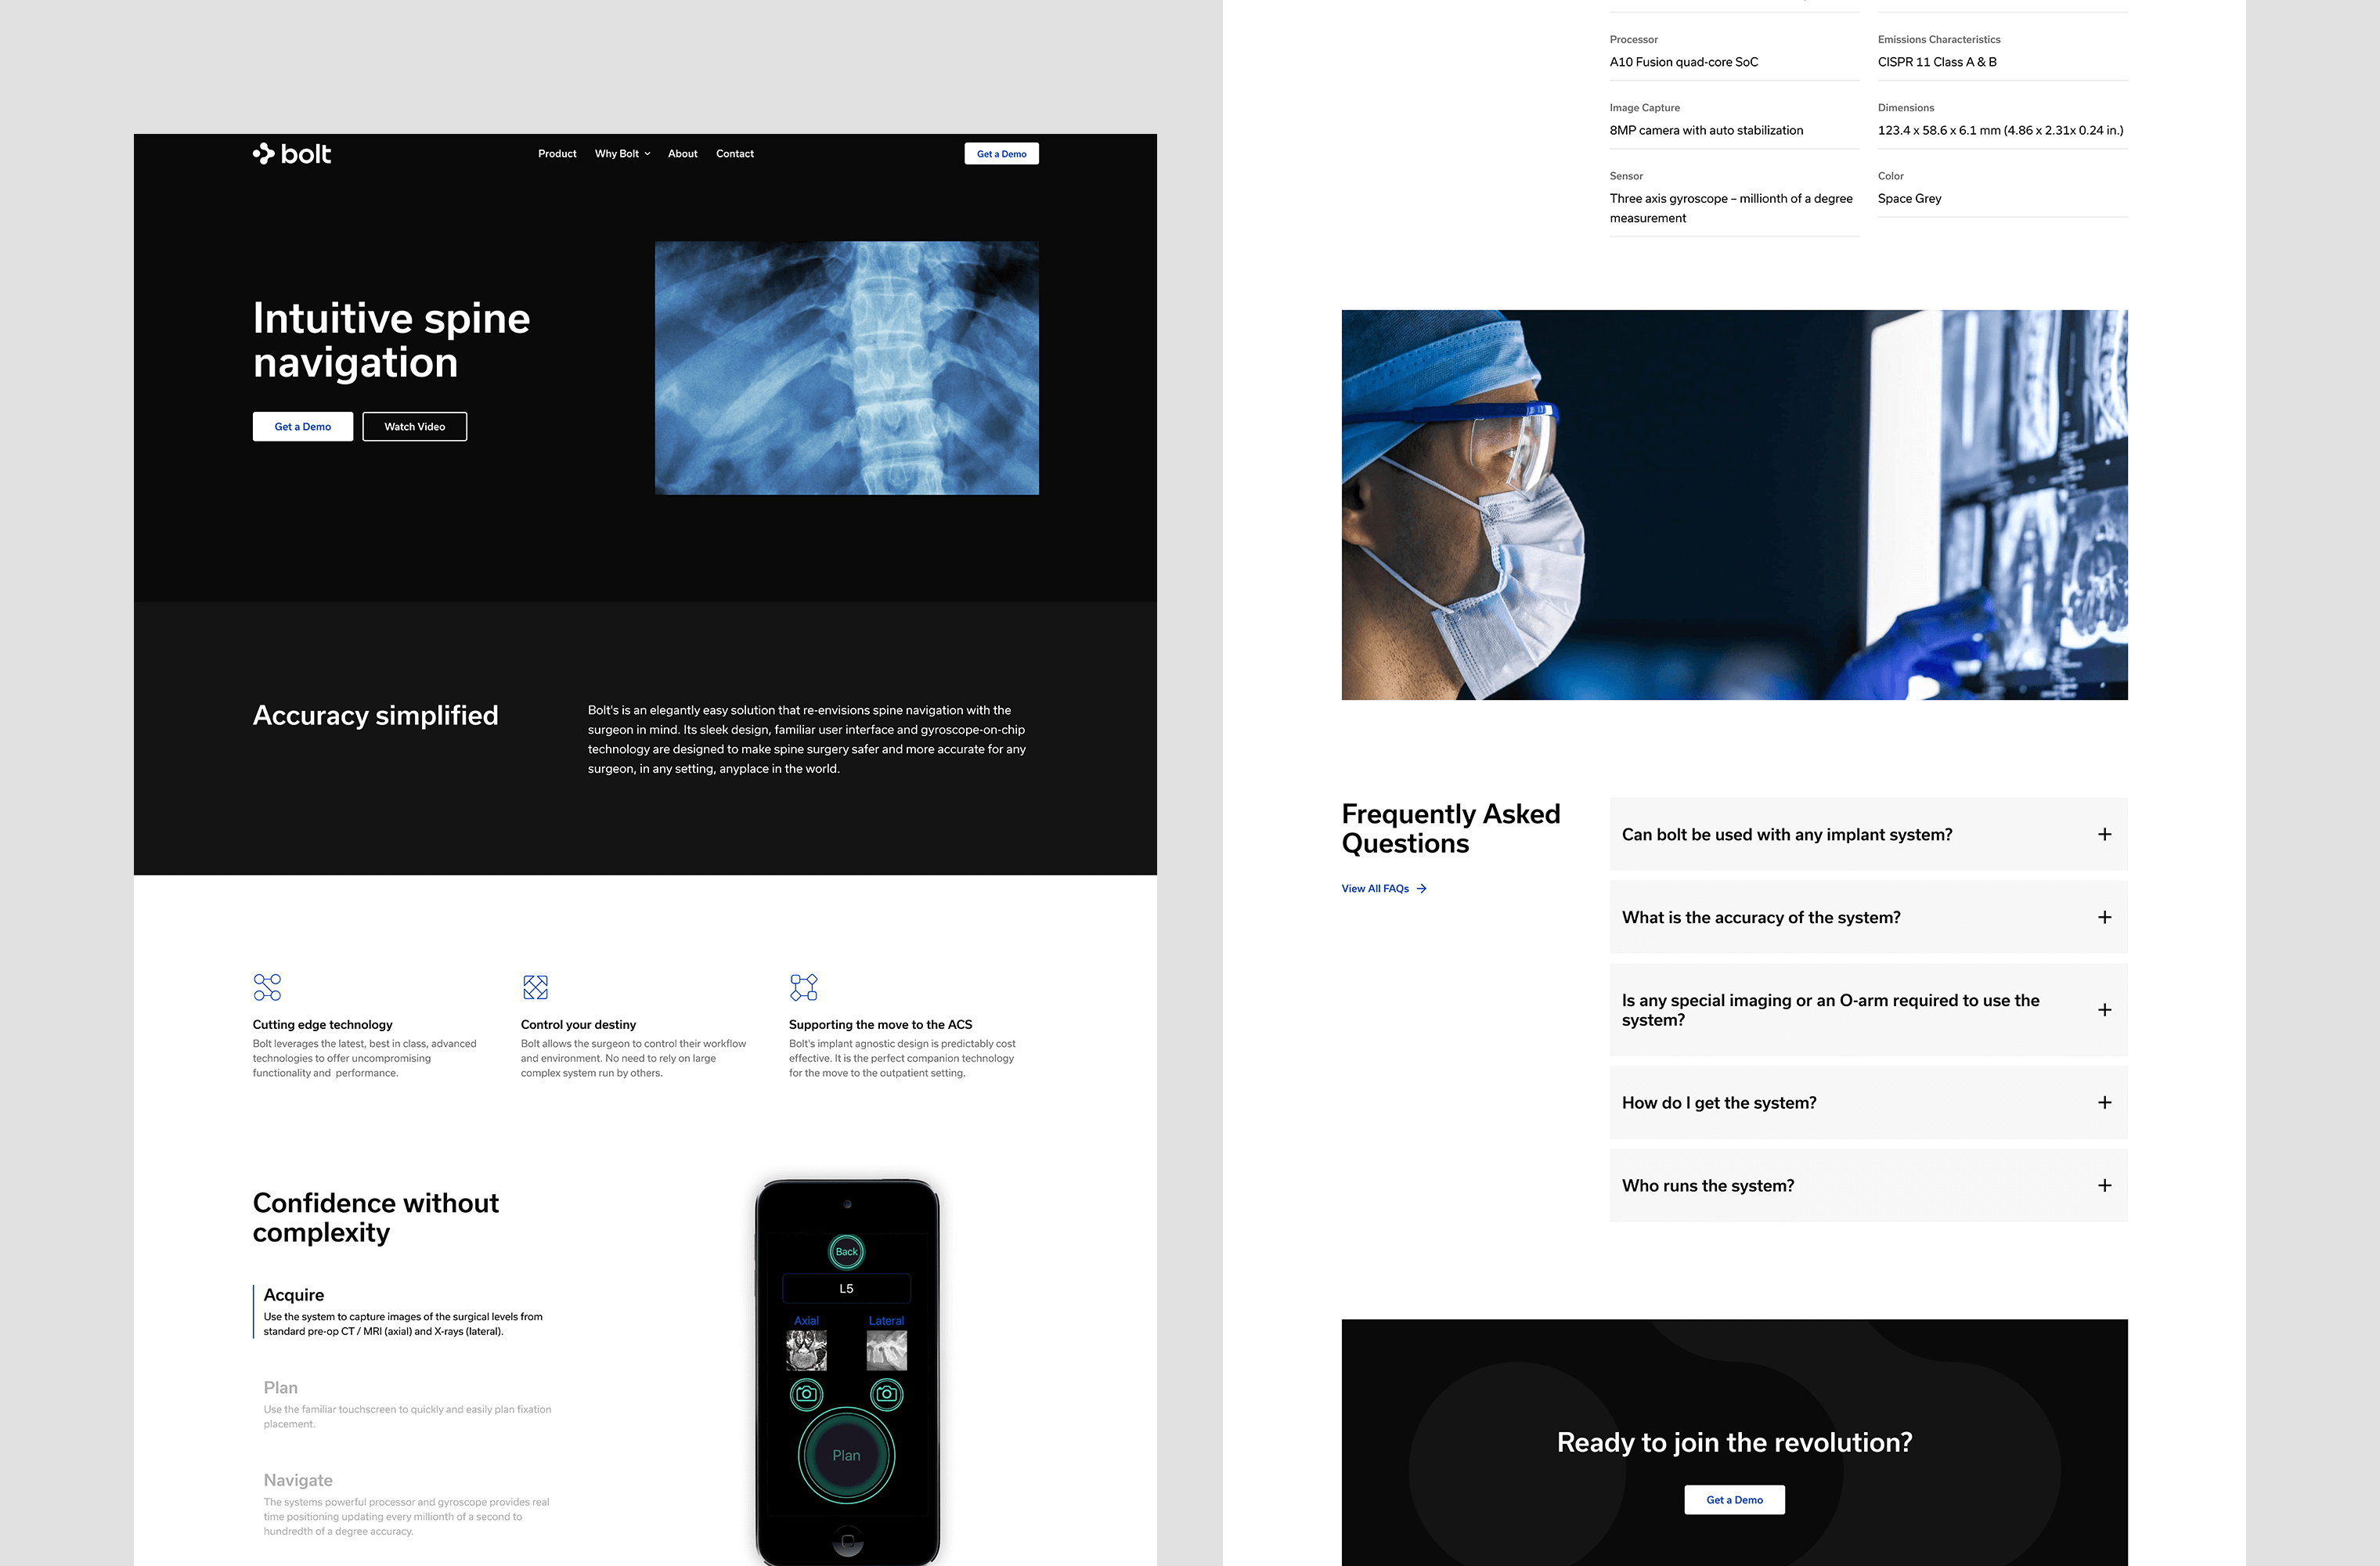 Desktop 'Product' page for the Bolt website